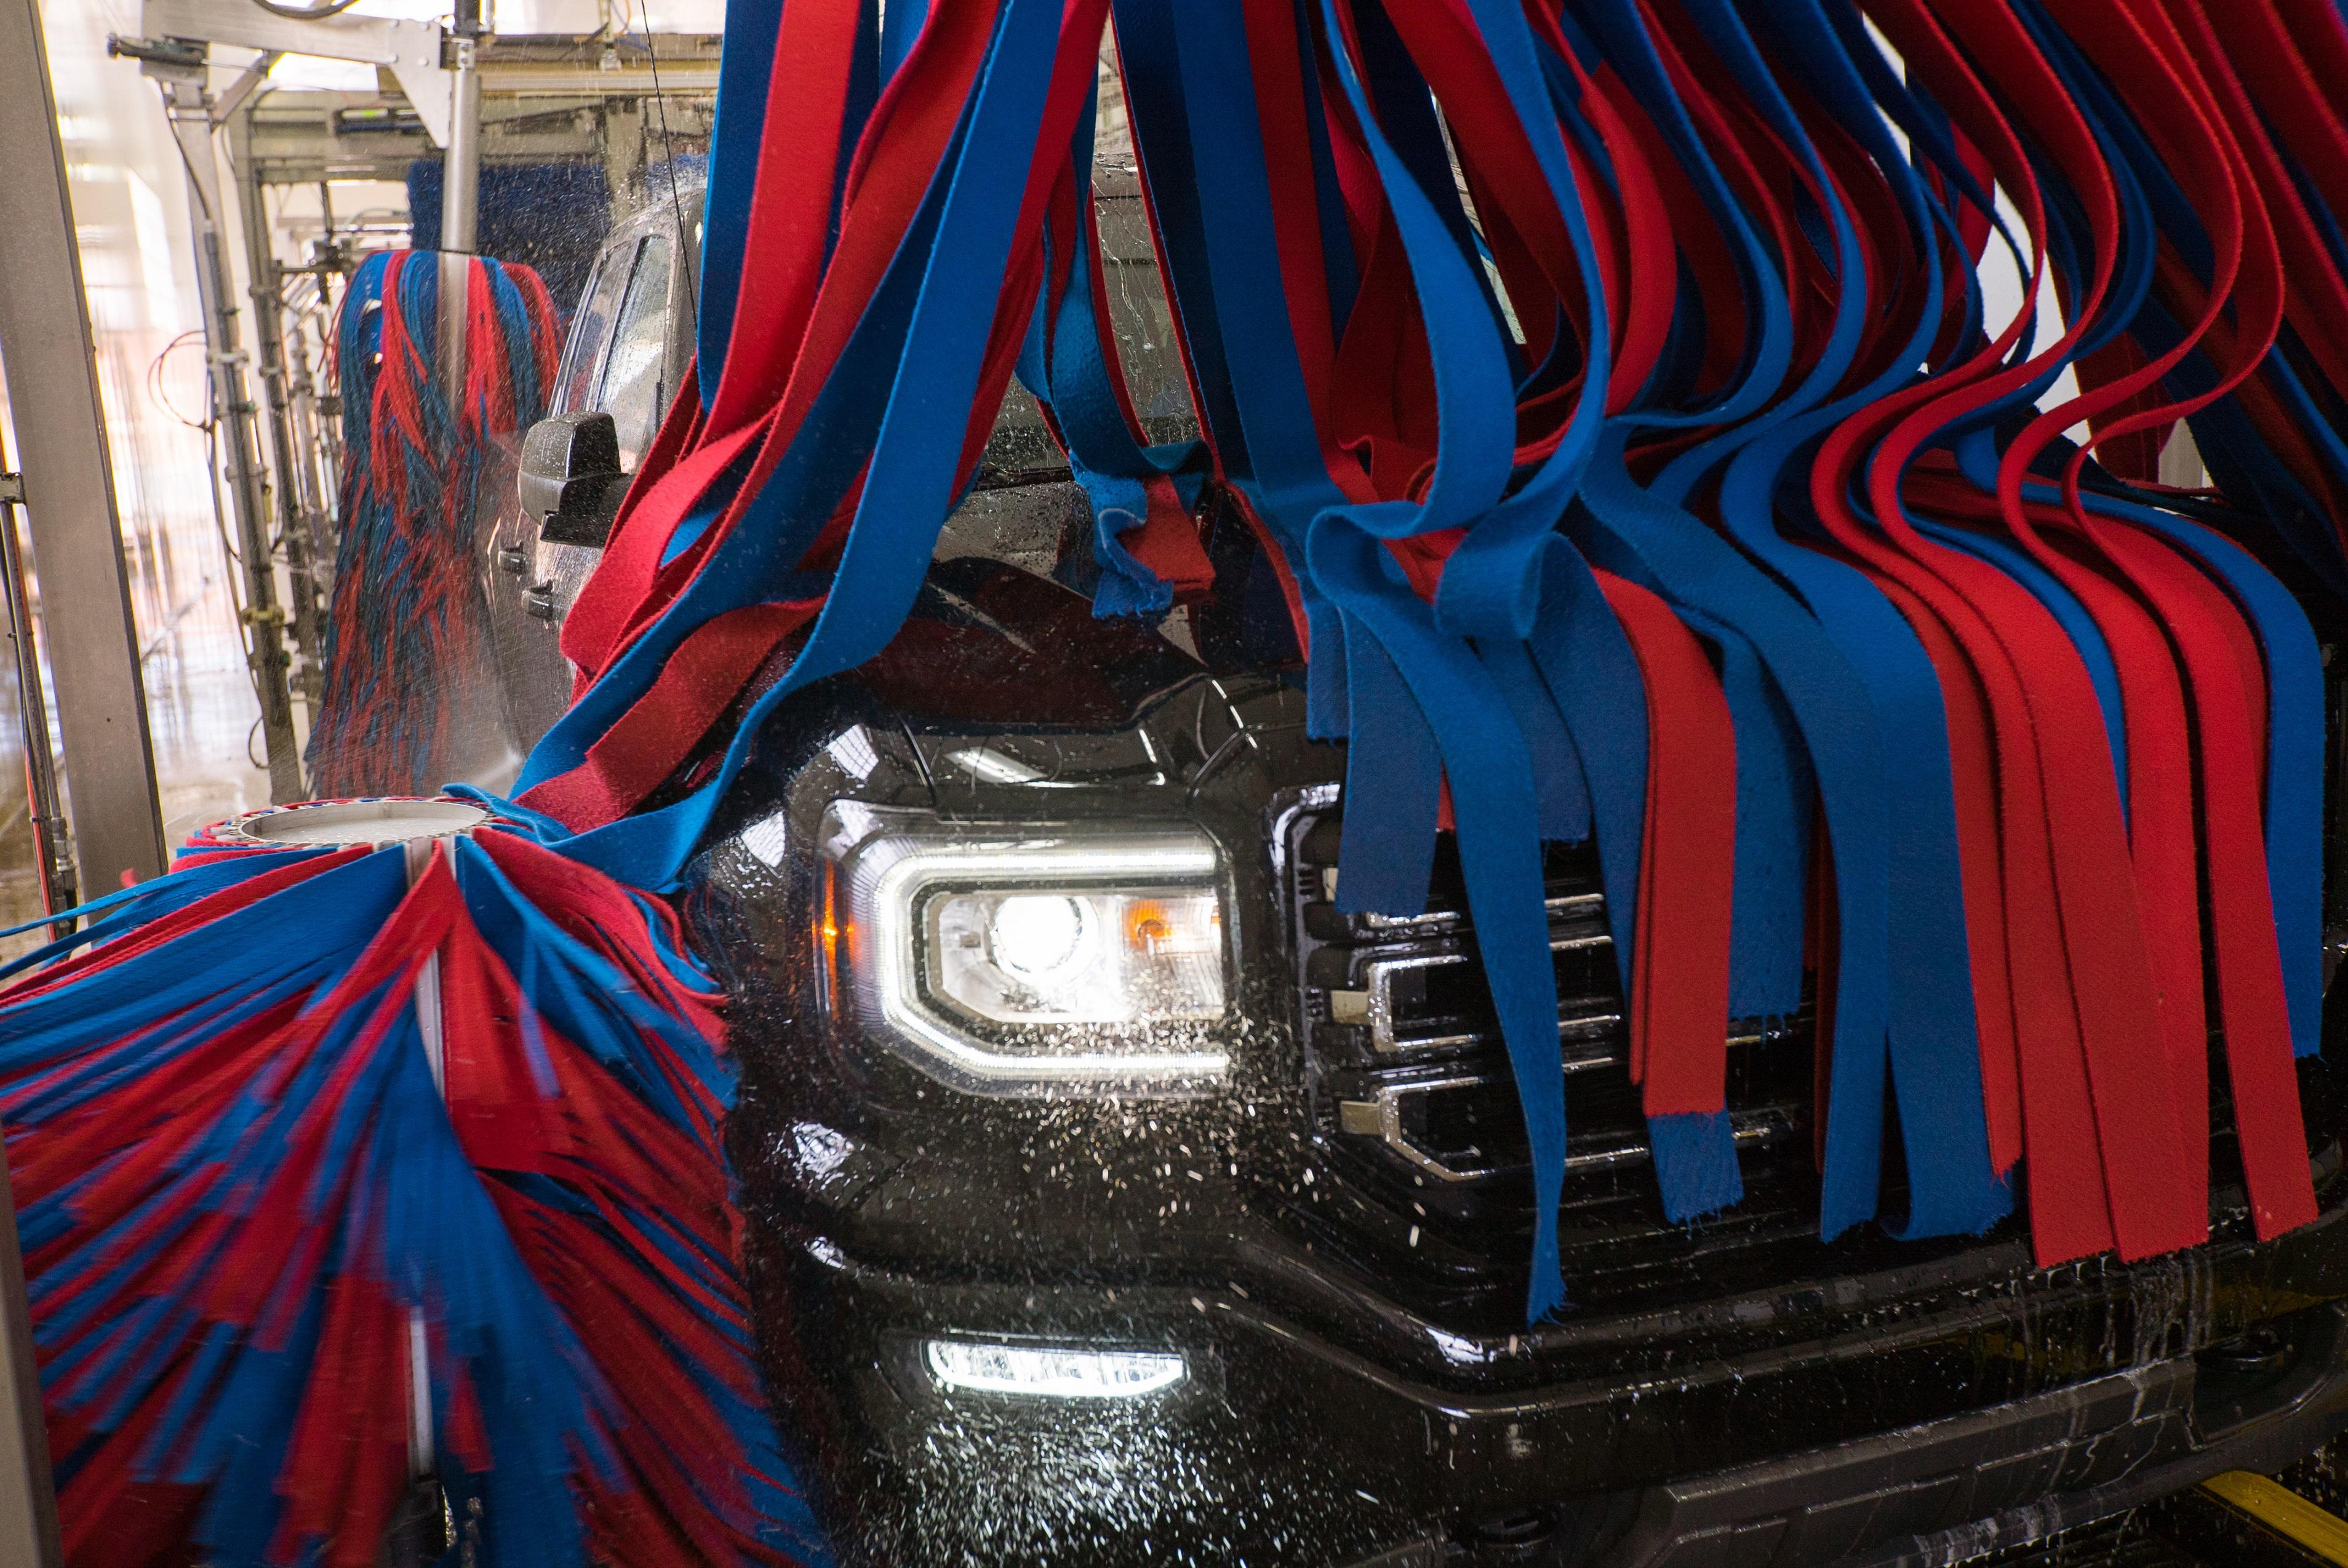 Tagg N Go Express Car Wash image 2